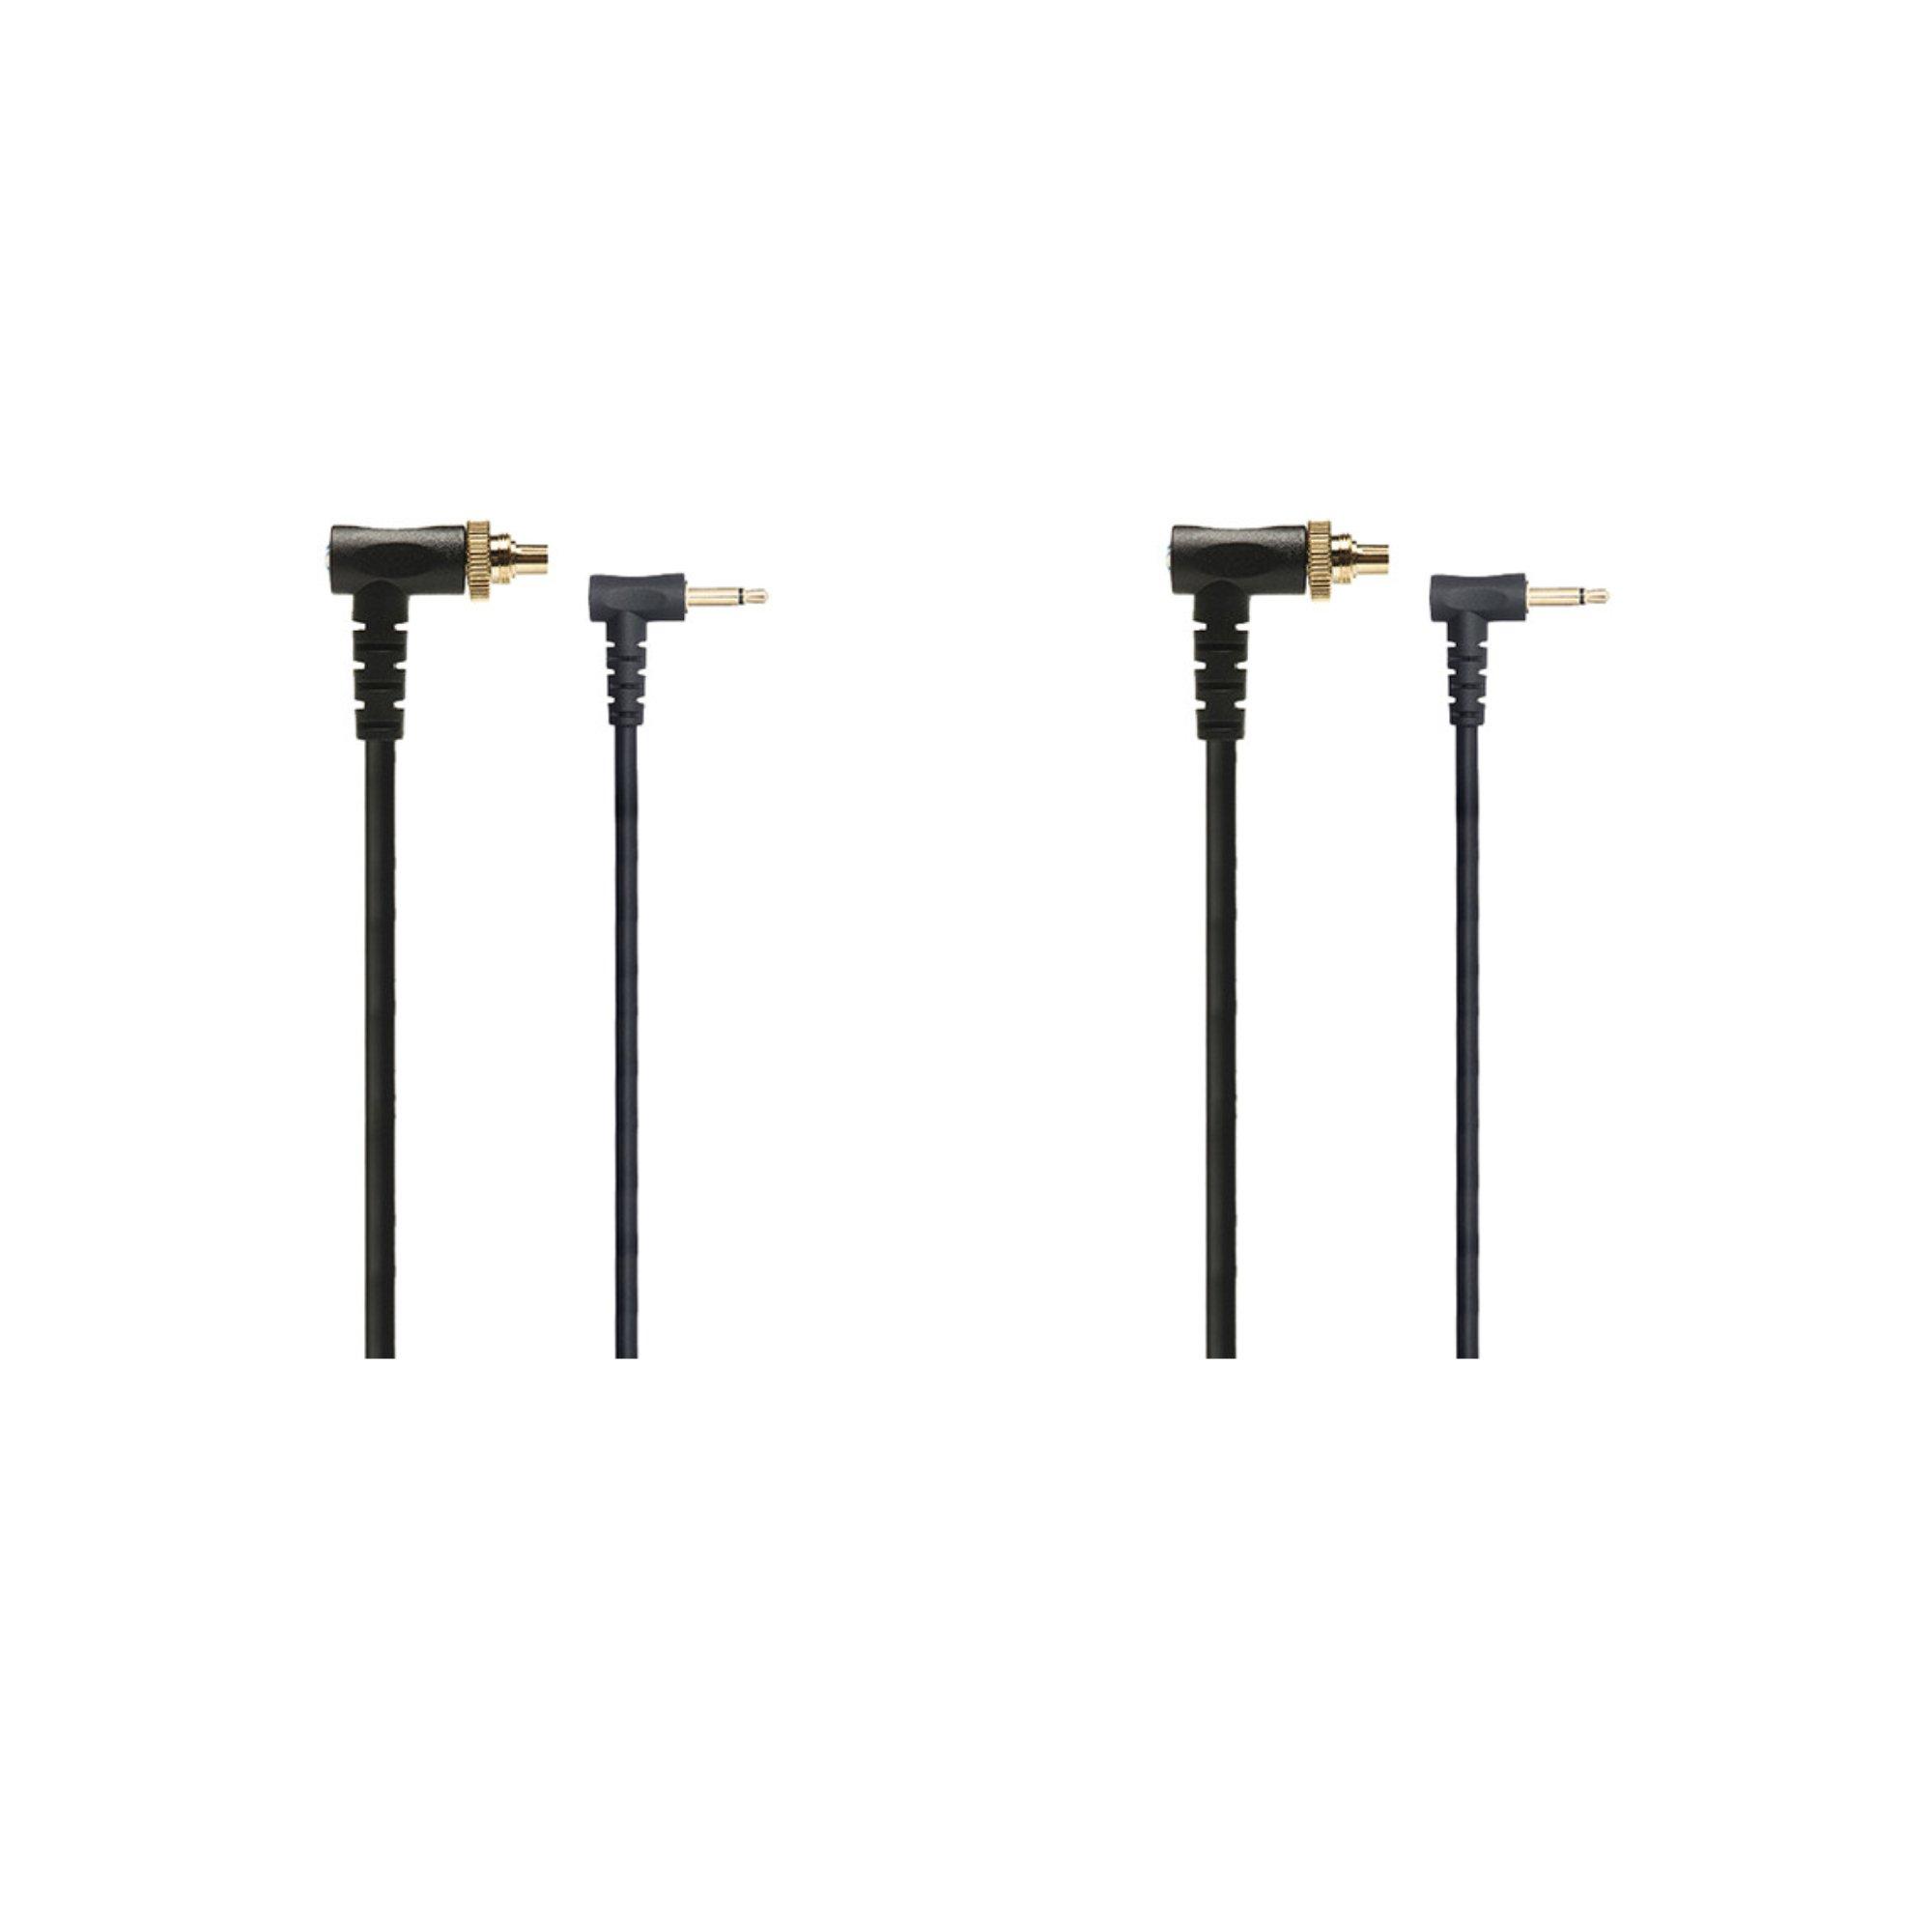 PocketWizard 804-310 1-Foot Locking PC Flash Sync Cable PC1N (Black) 2-Pack by PocketWizard